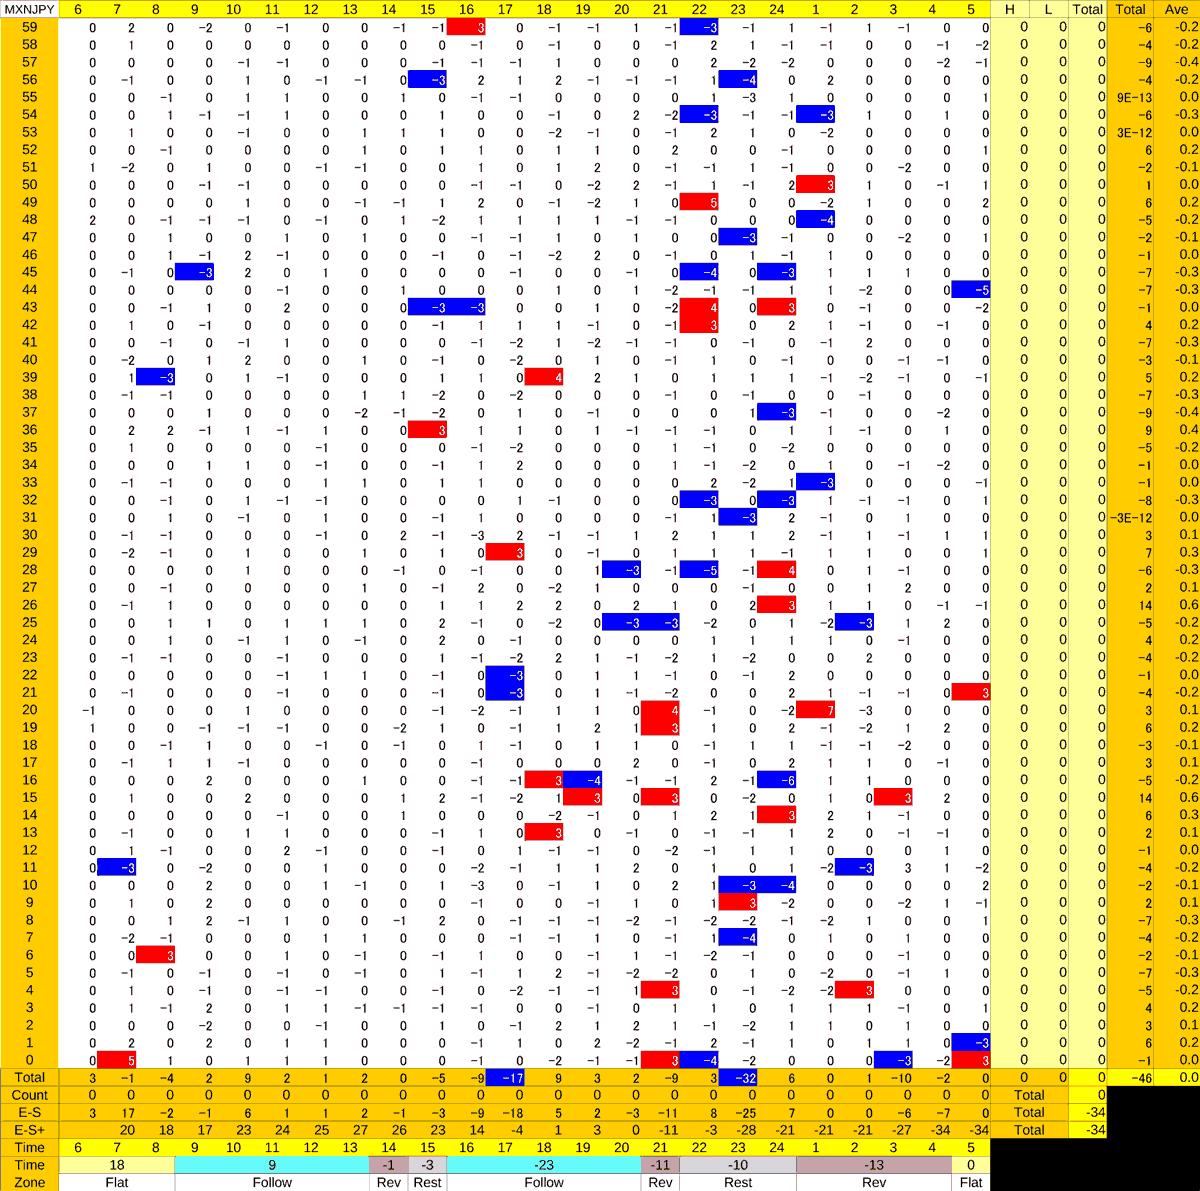 20201021_HS(3)MXNJPY